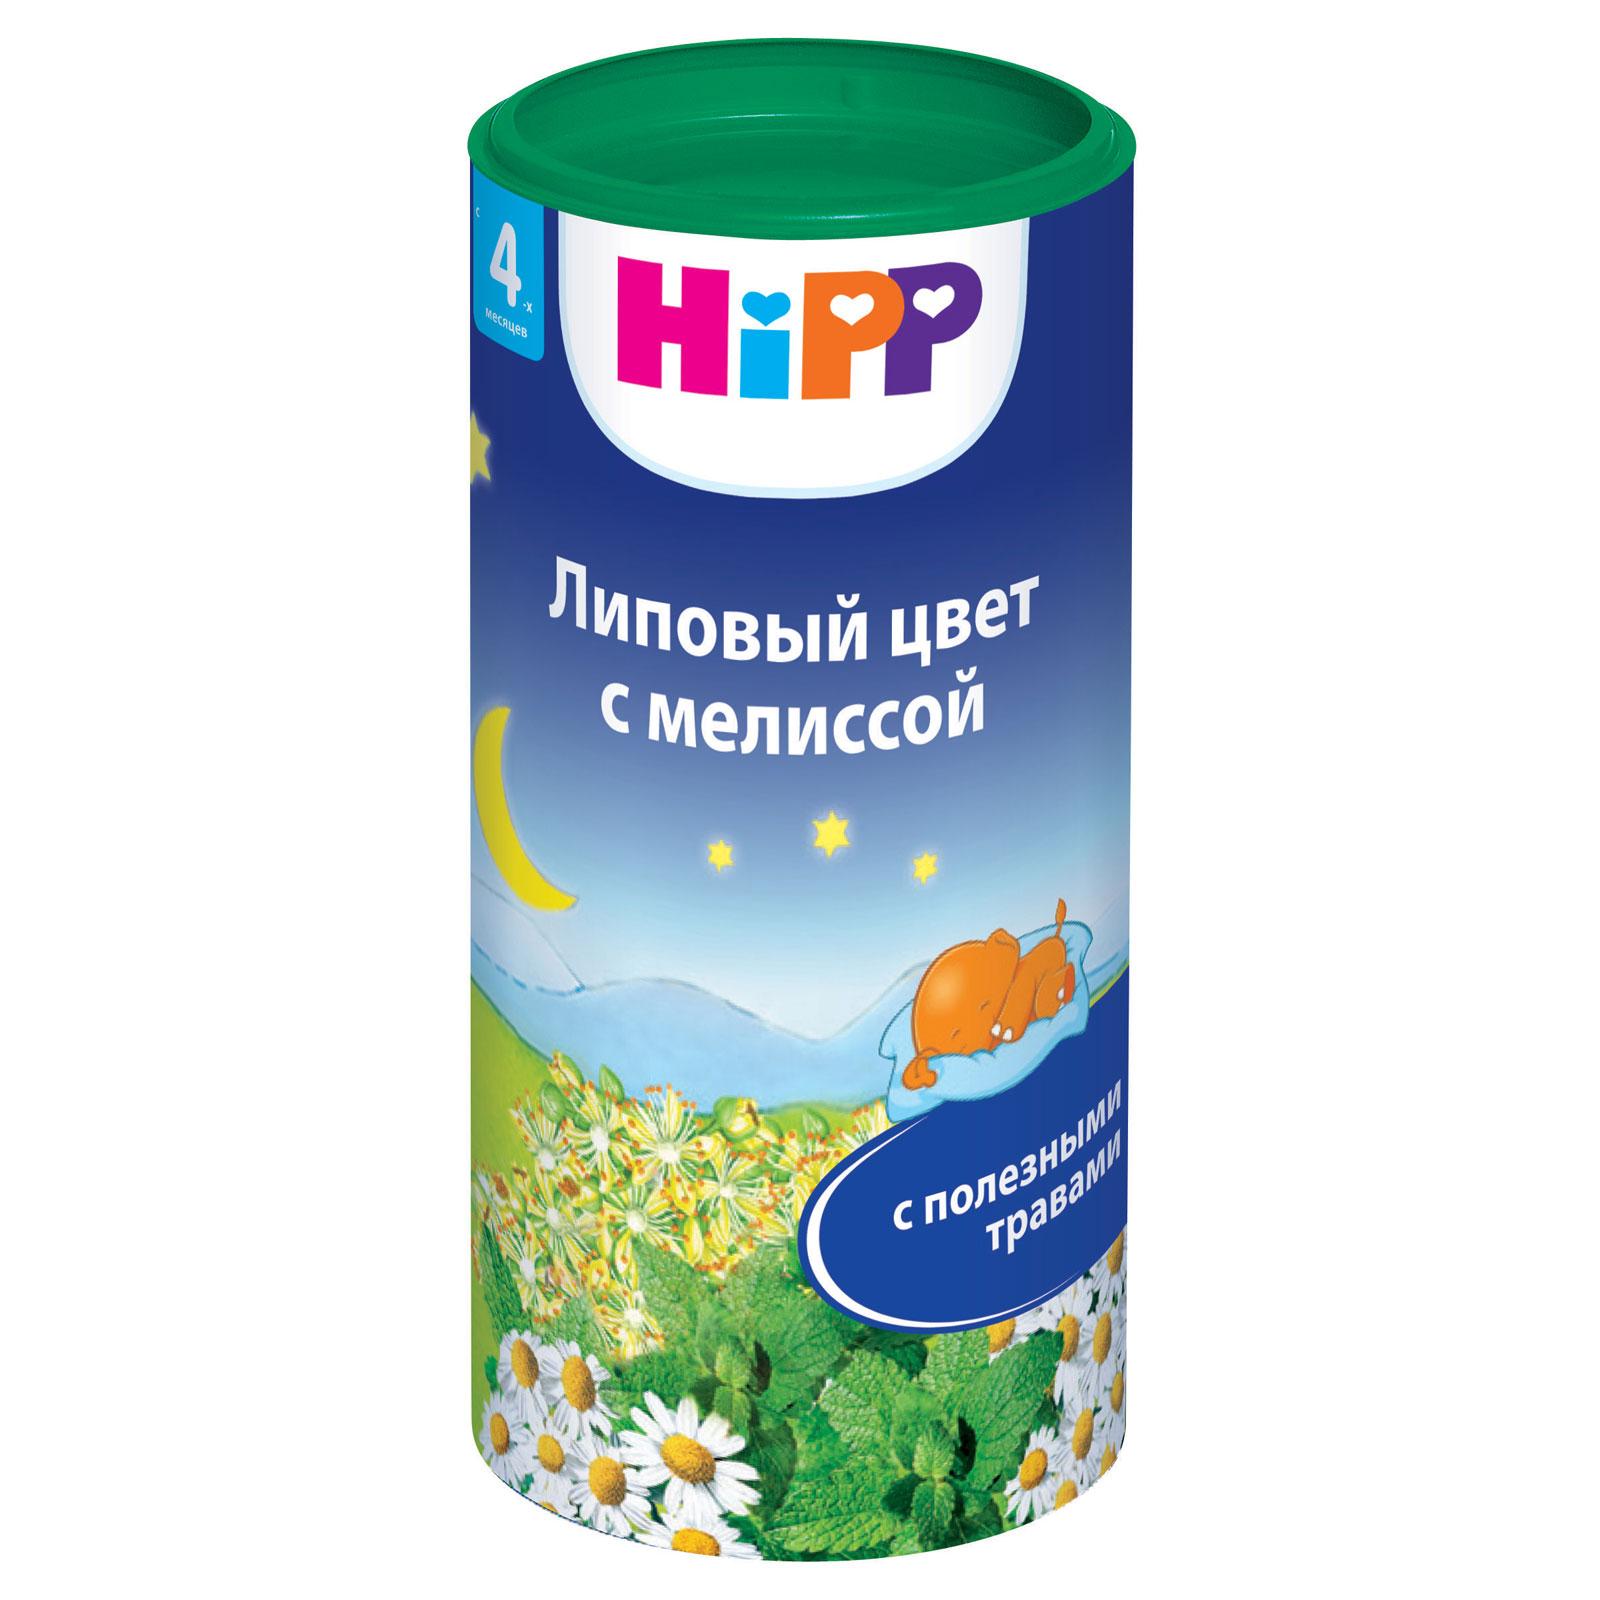 ��� ������� Hipp ����������������� 200 �� ���� �������  (� 4 ���)